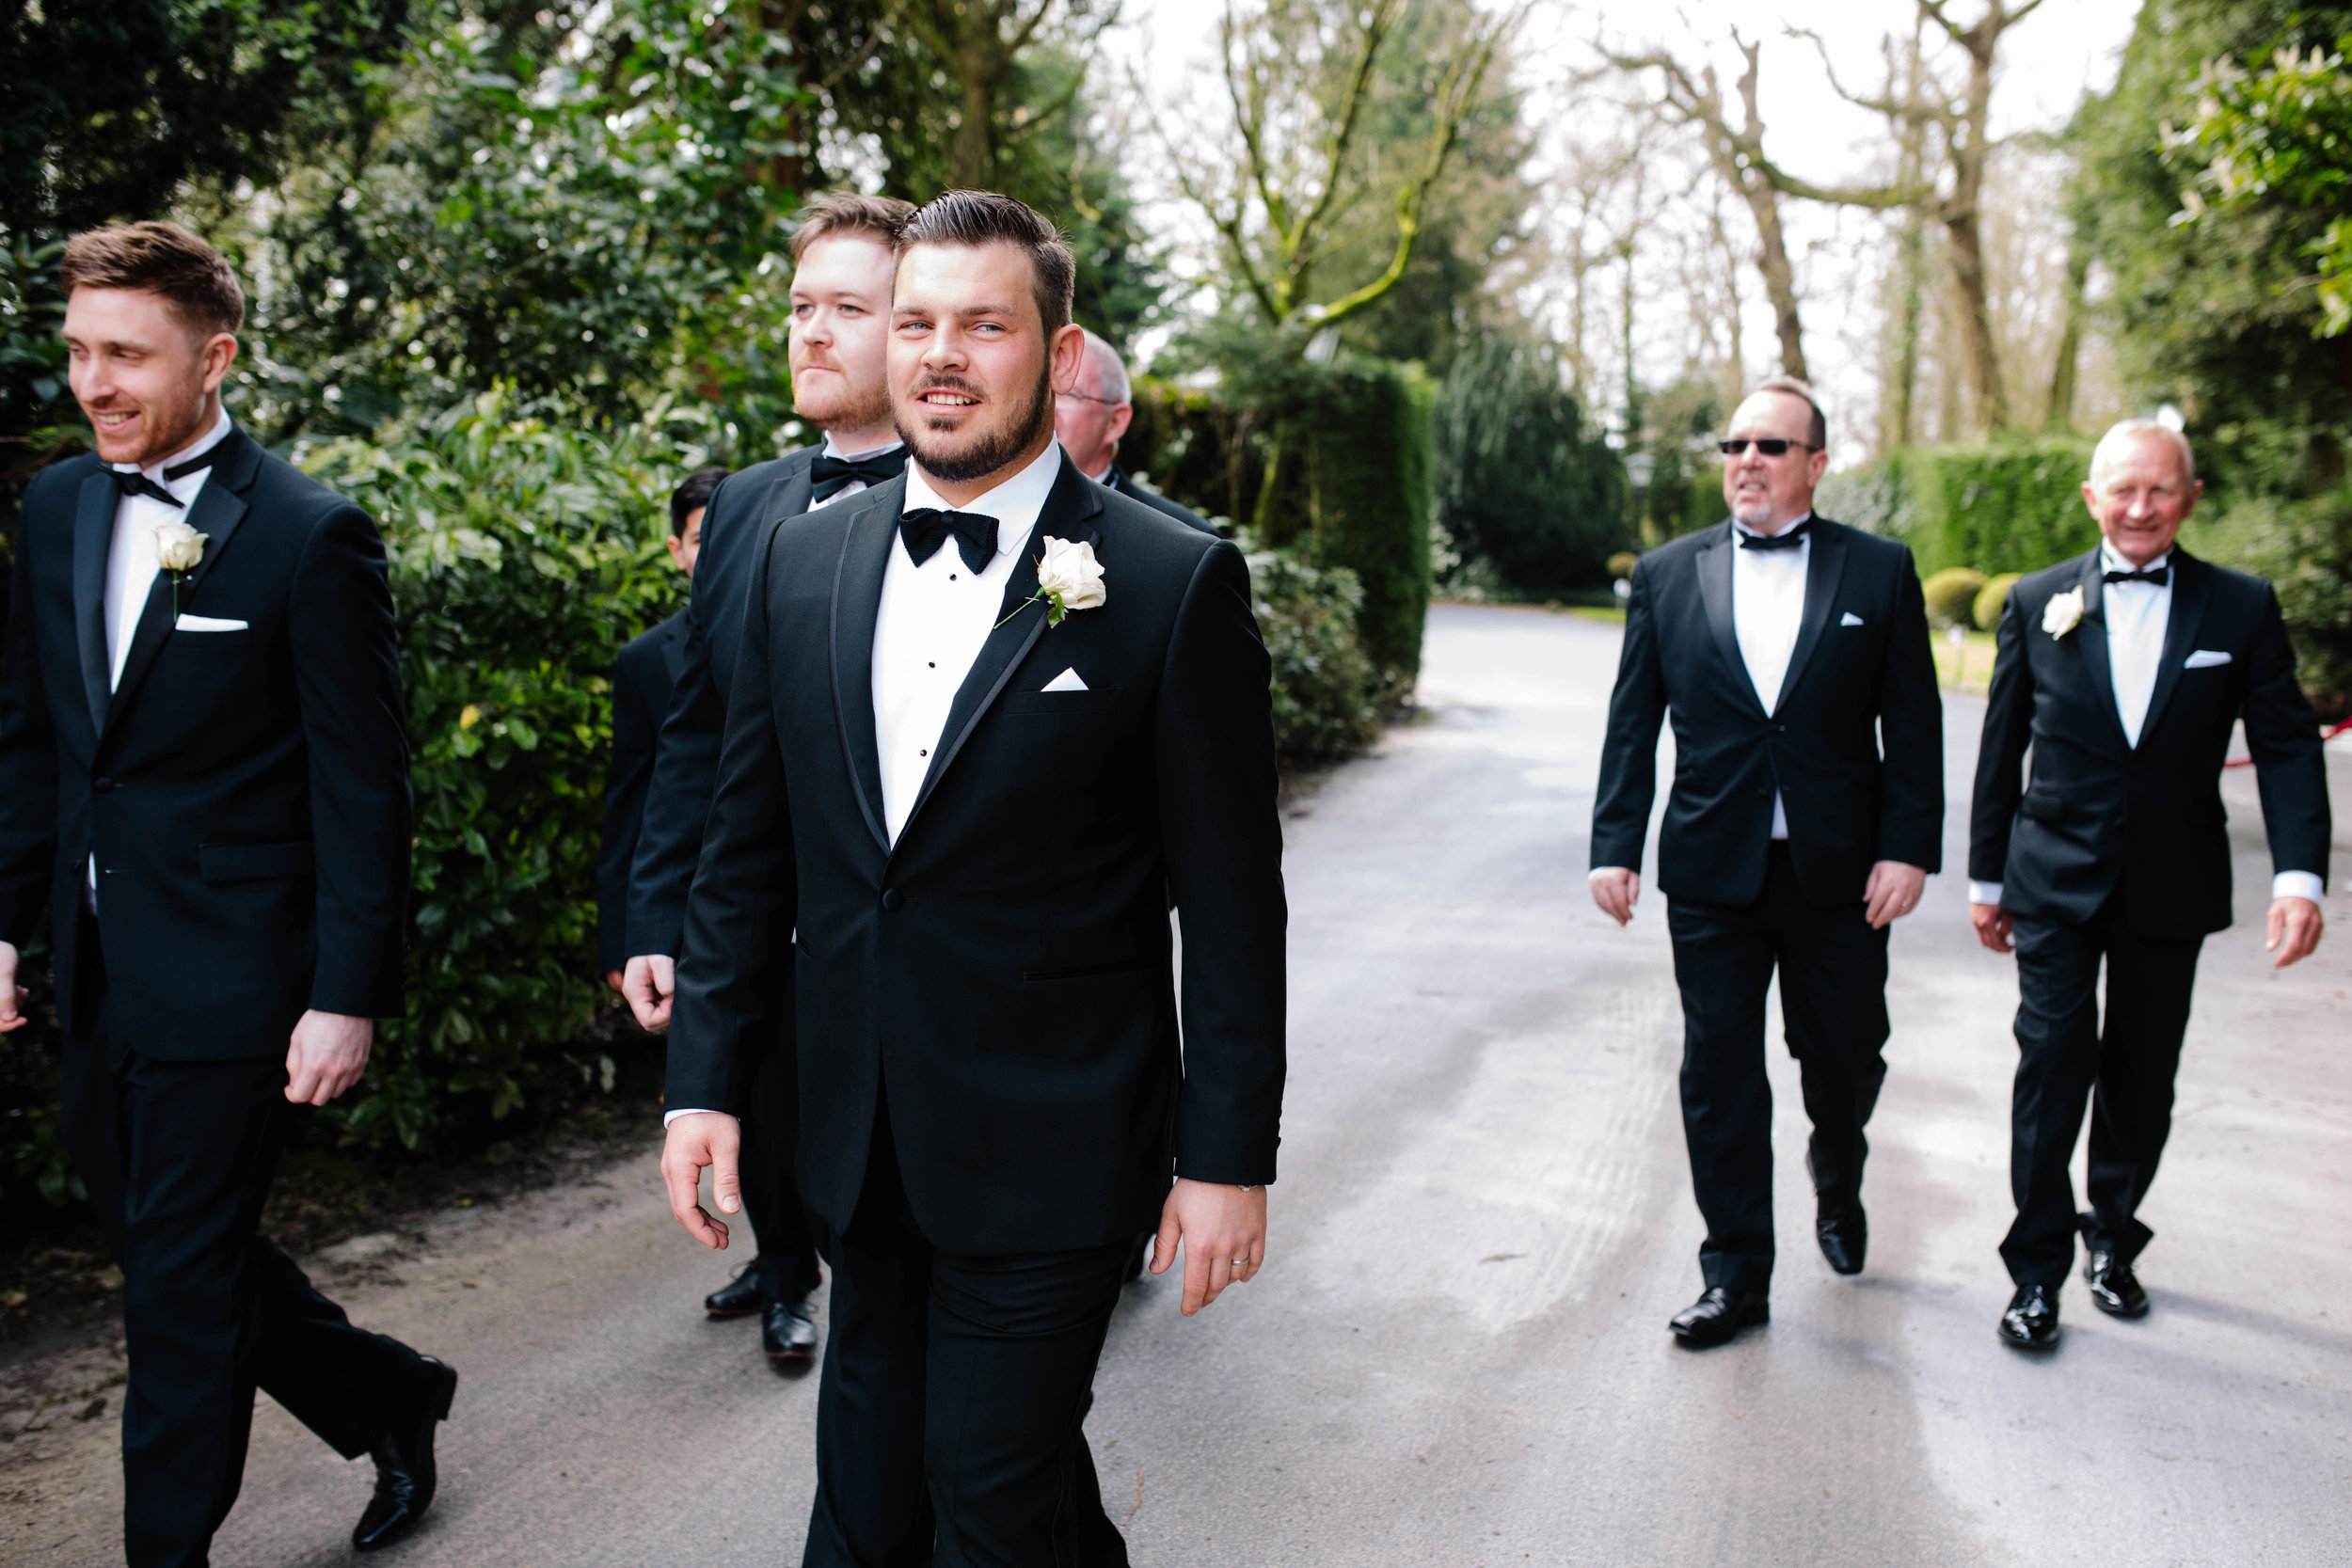 Groomsmen pictures Matt Herrington Wedding Photographer Lancashire North West